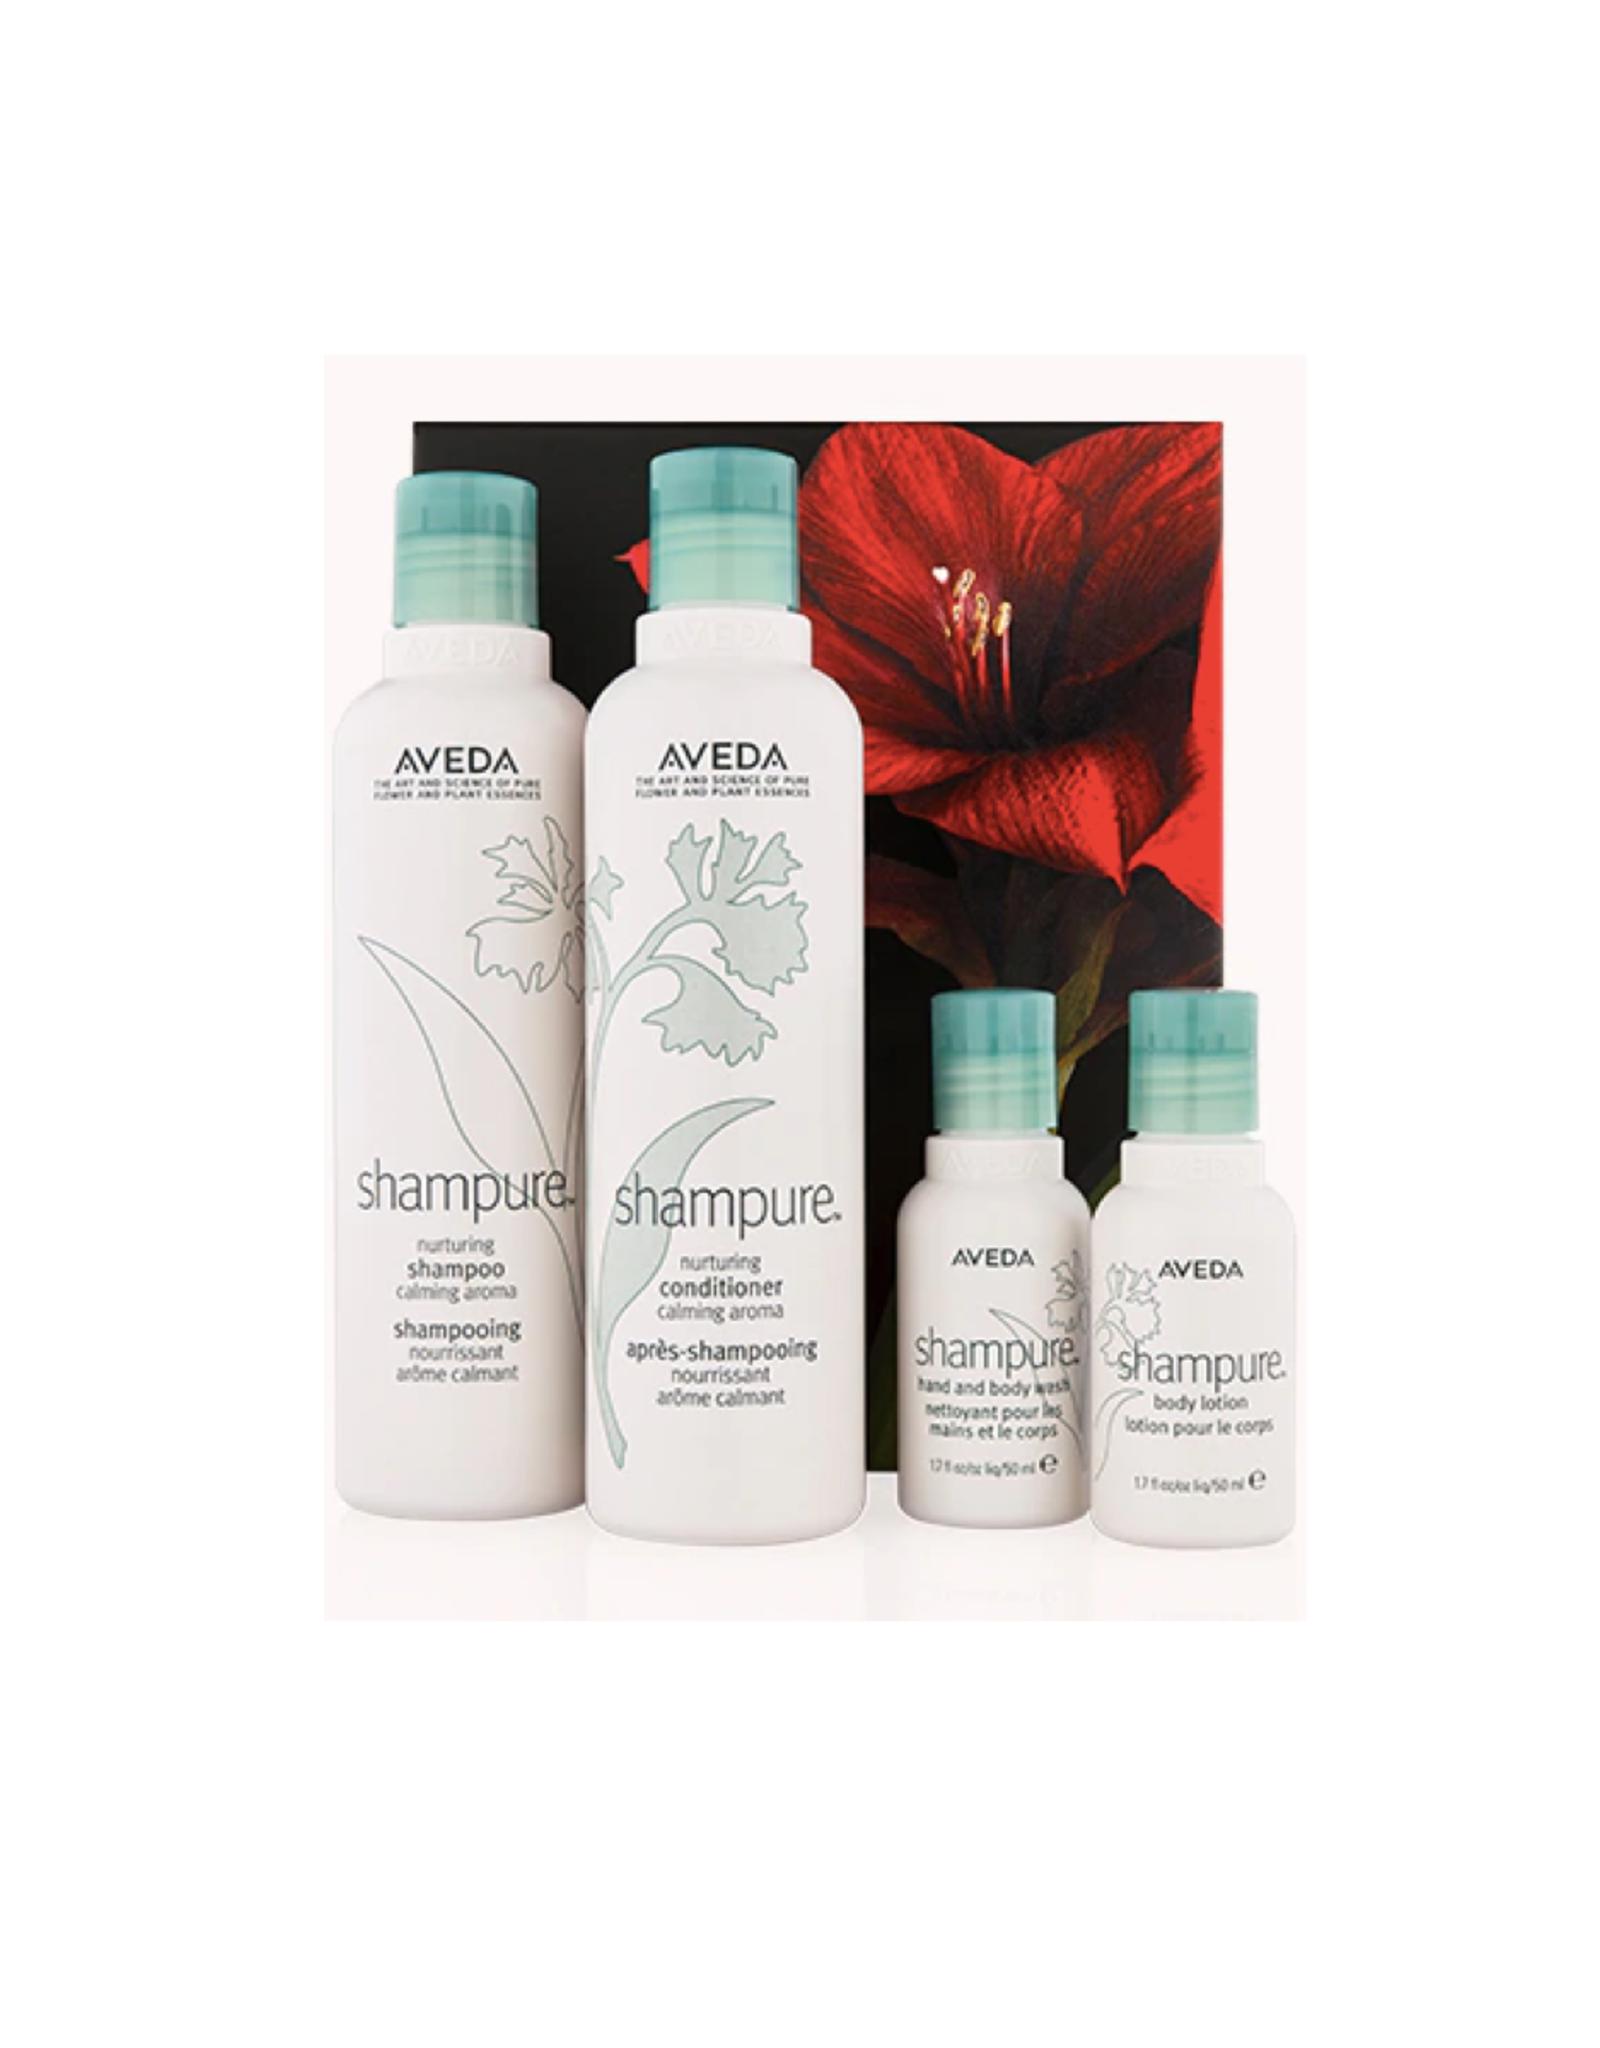 AVEDA Shampure™ Calming Hair & Body Set